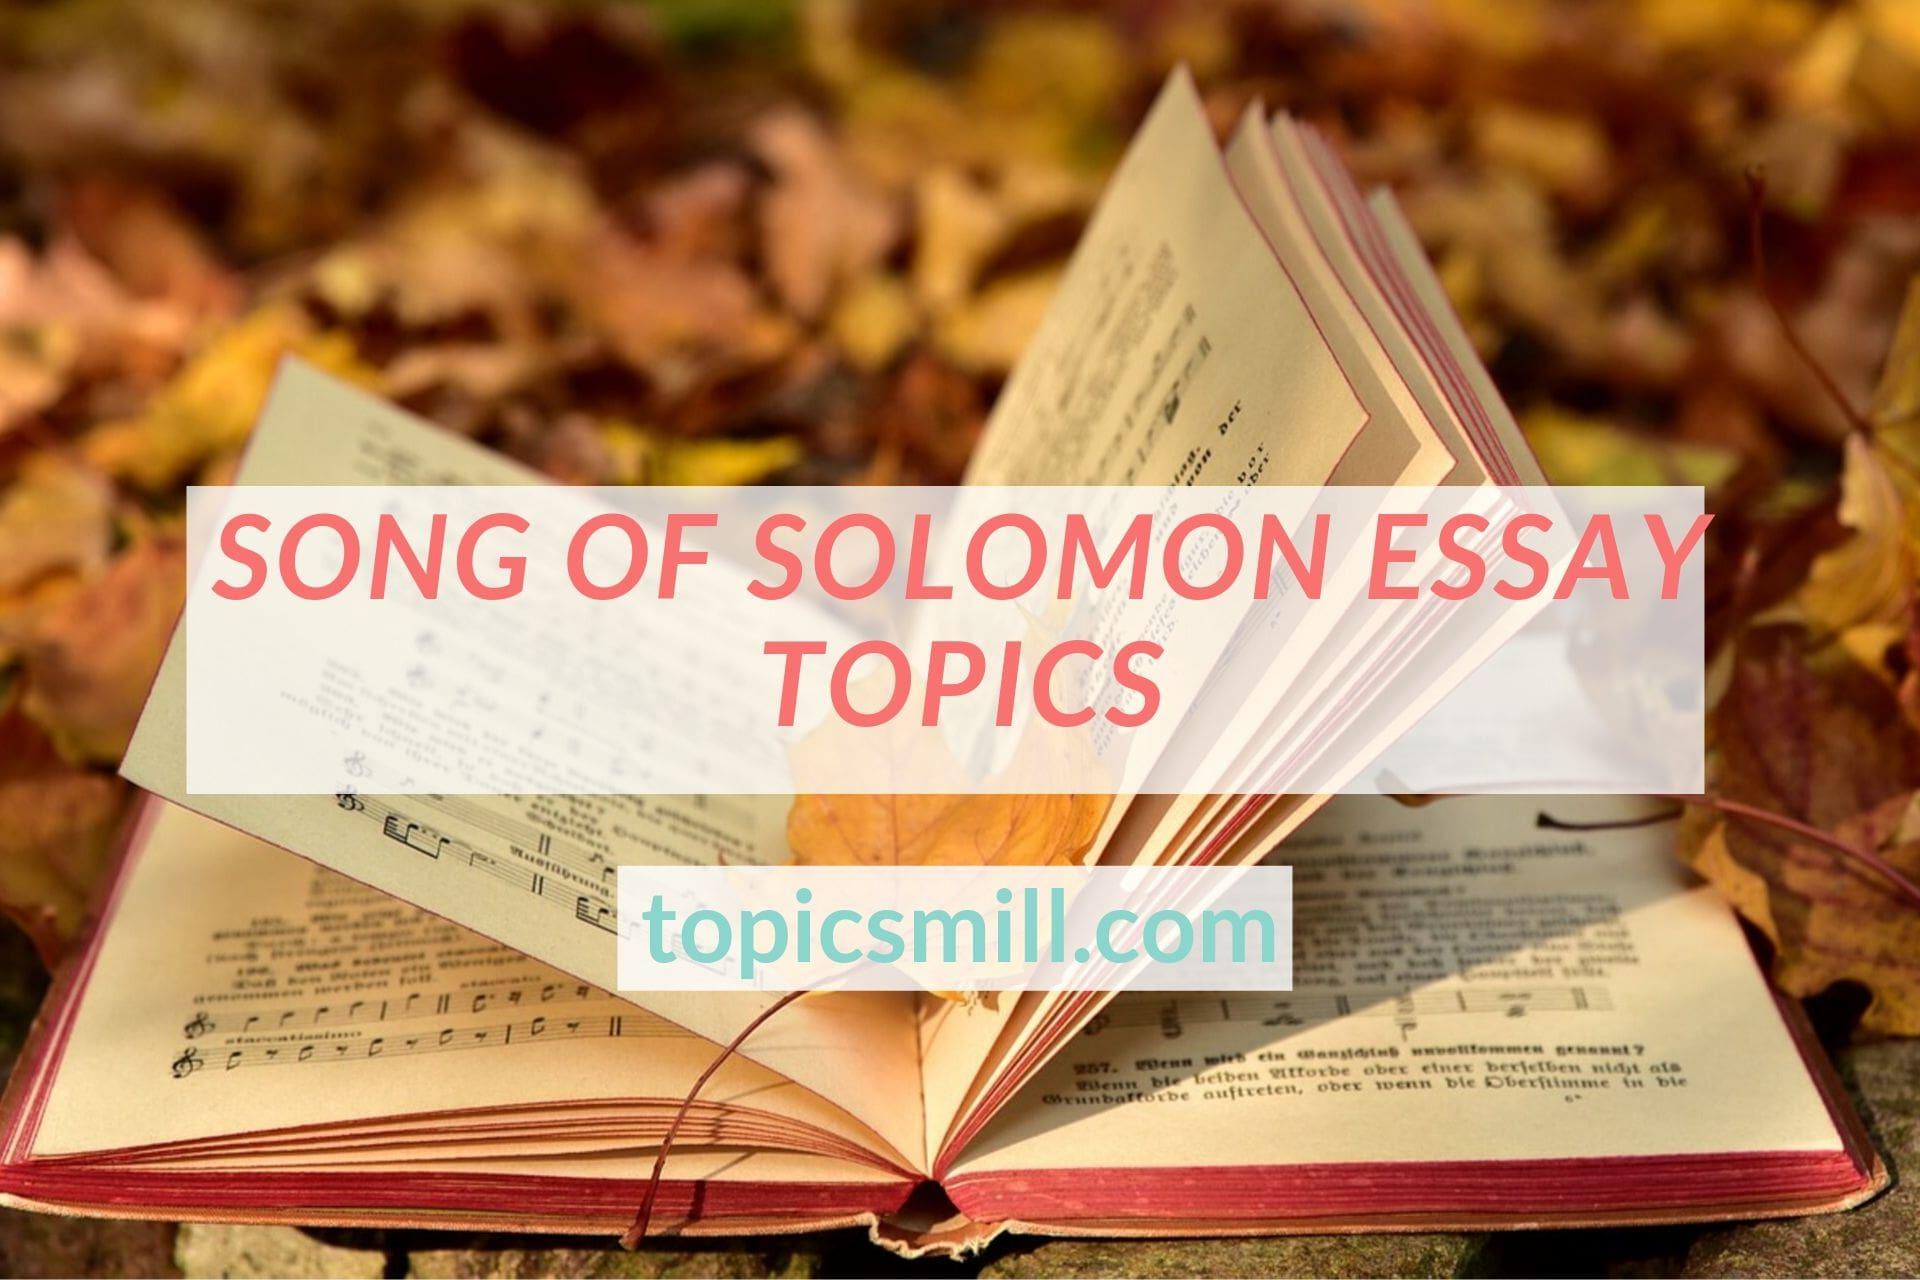 Song of solomon essay